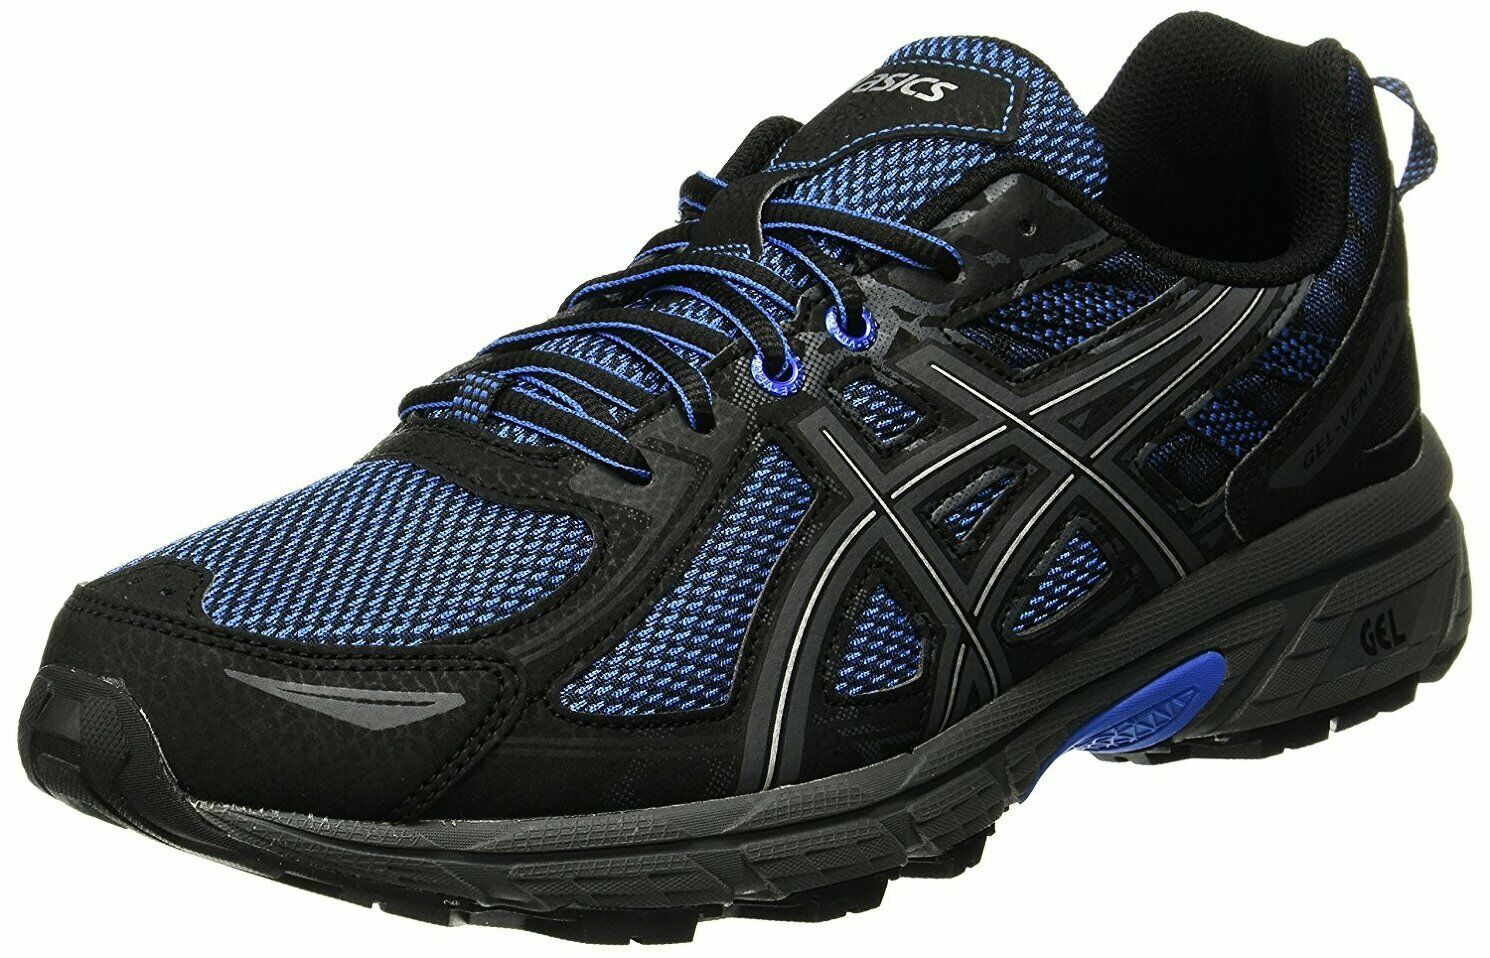 ASICS Men's Gel-Venture 6 Running shoes - Choose SZ color